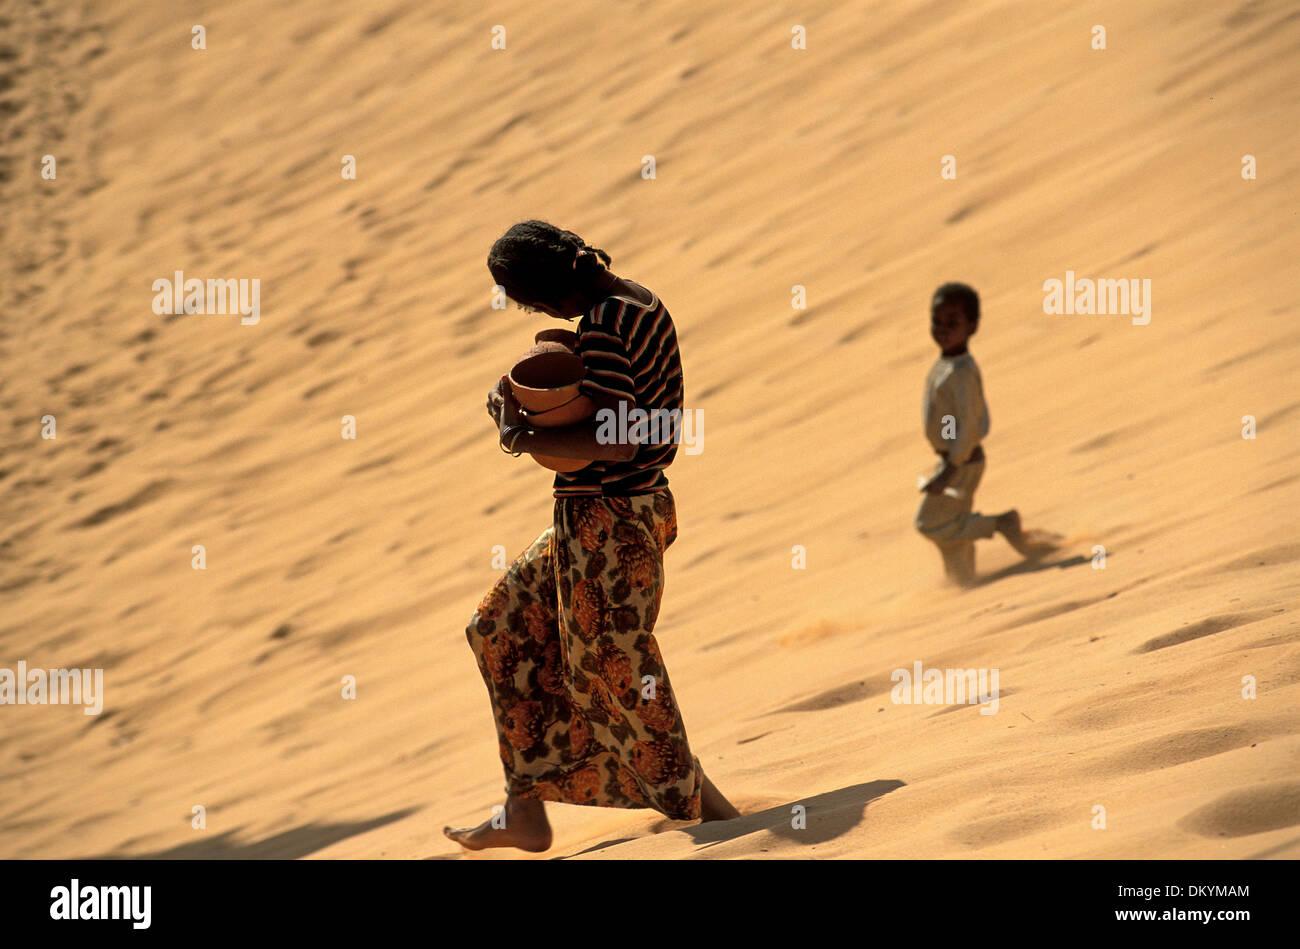 La population touareg de Timimoun en Algérie. Photo Stock